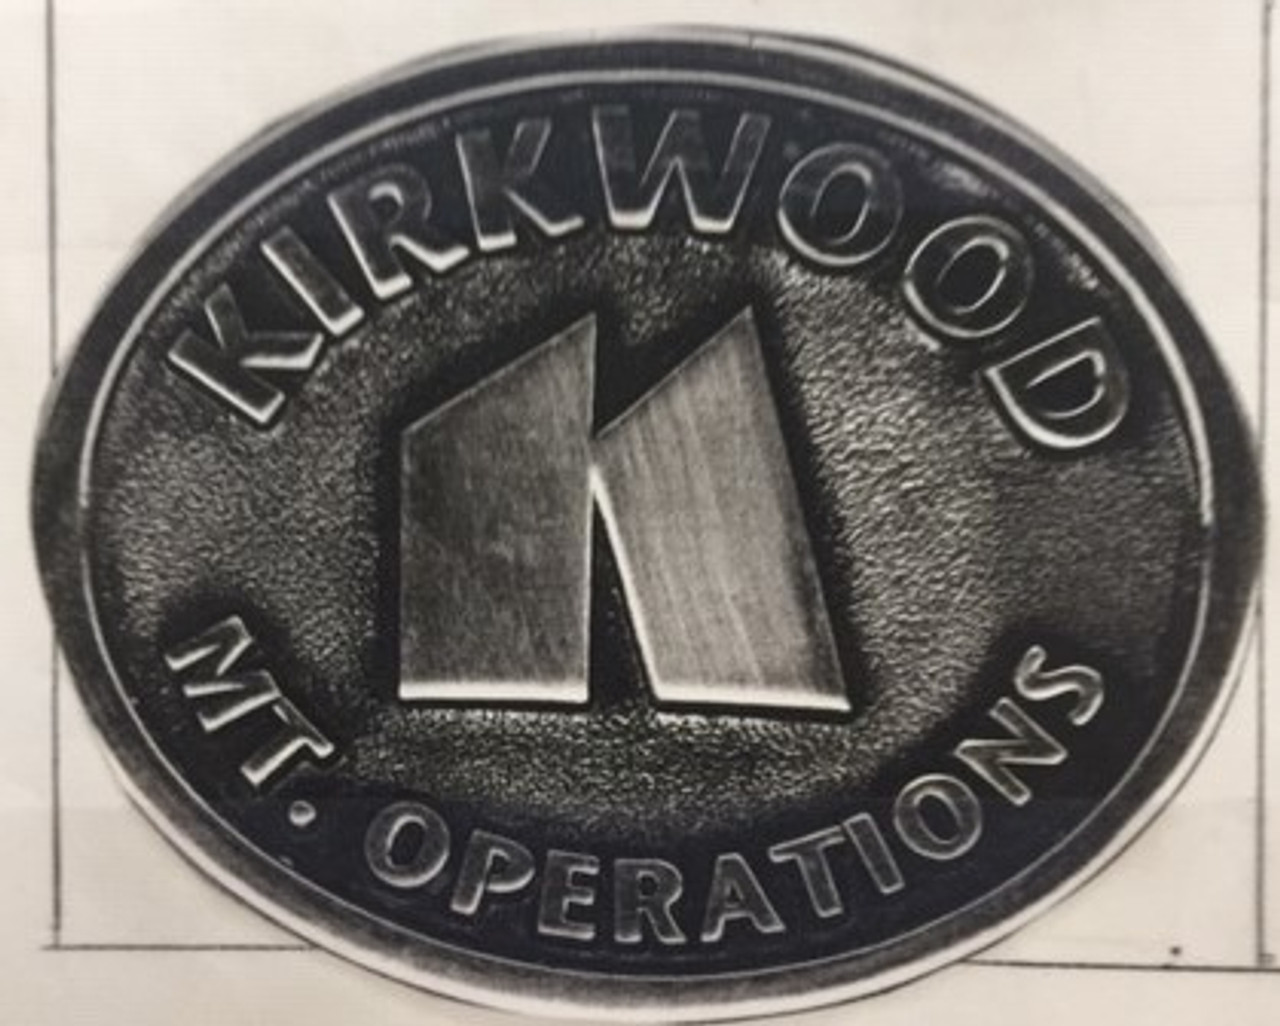 Kirkwood Mt. Operations Buckle